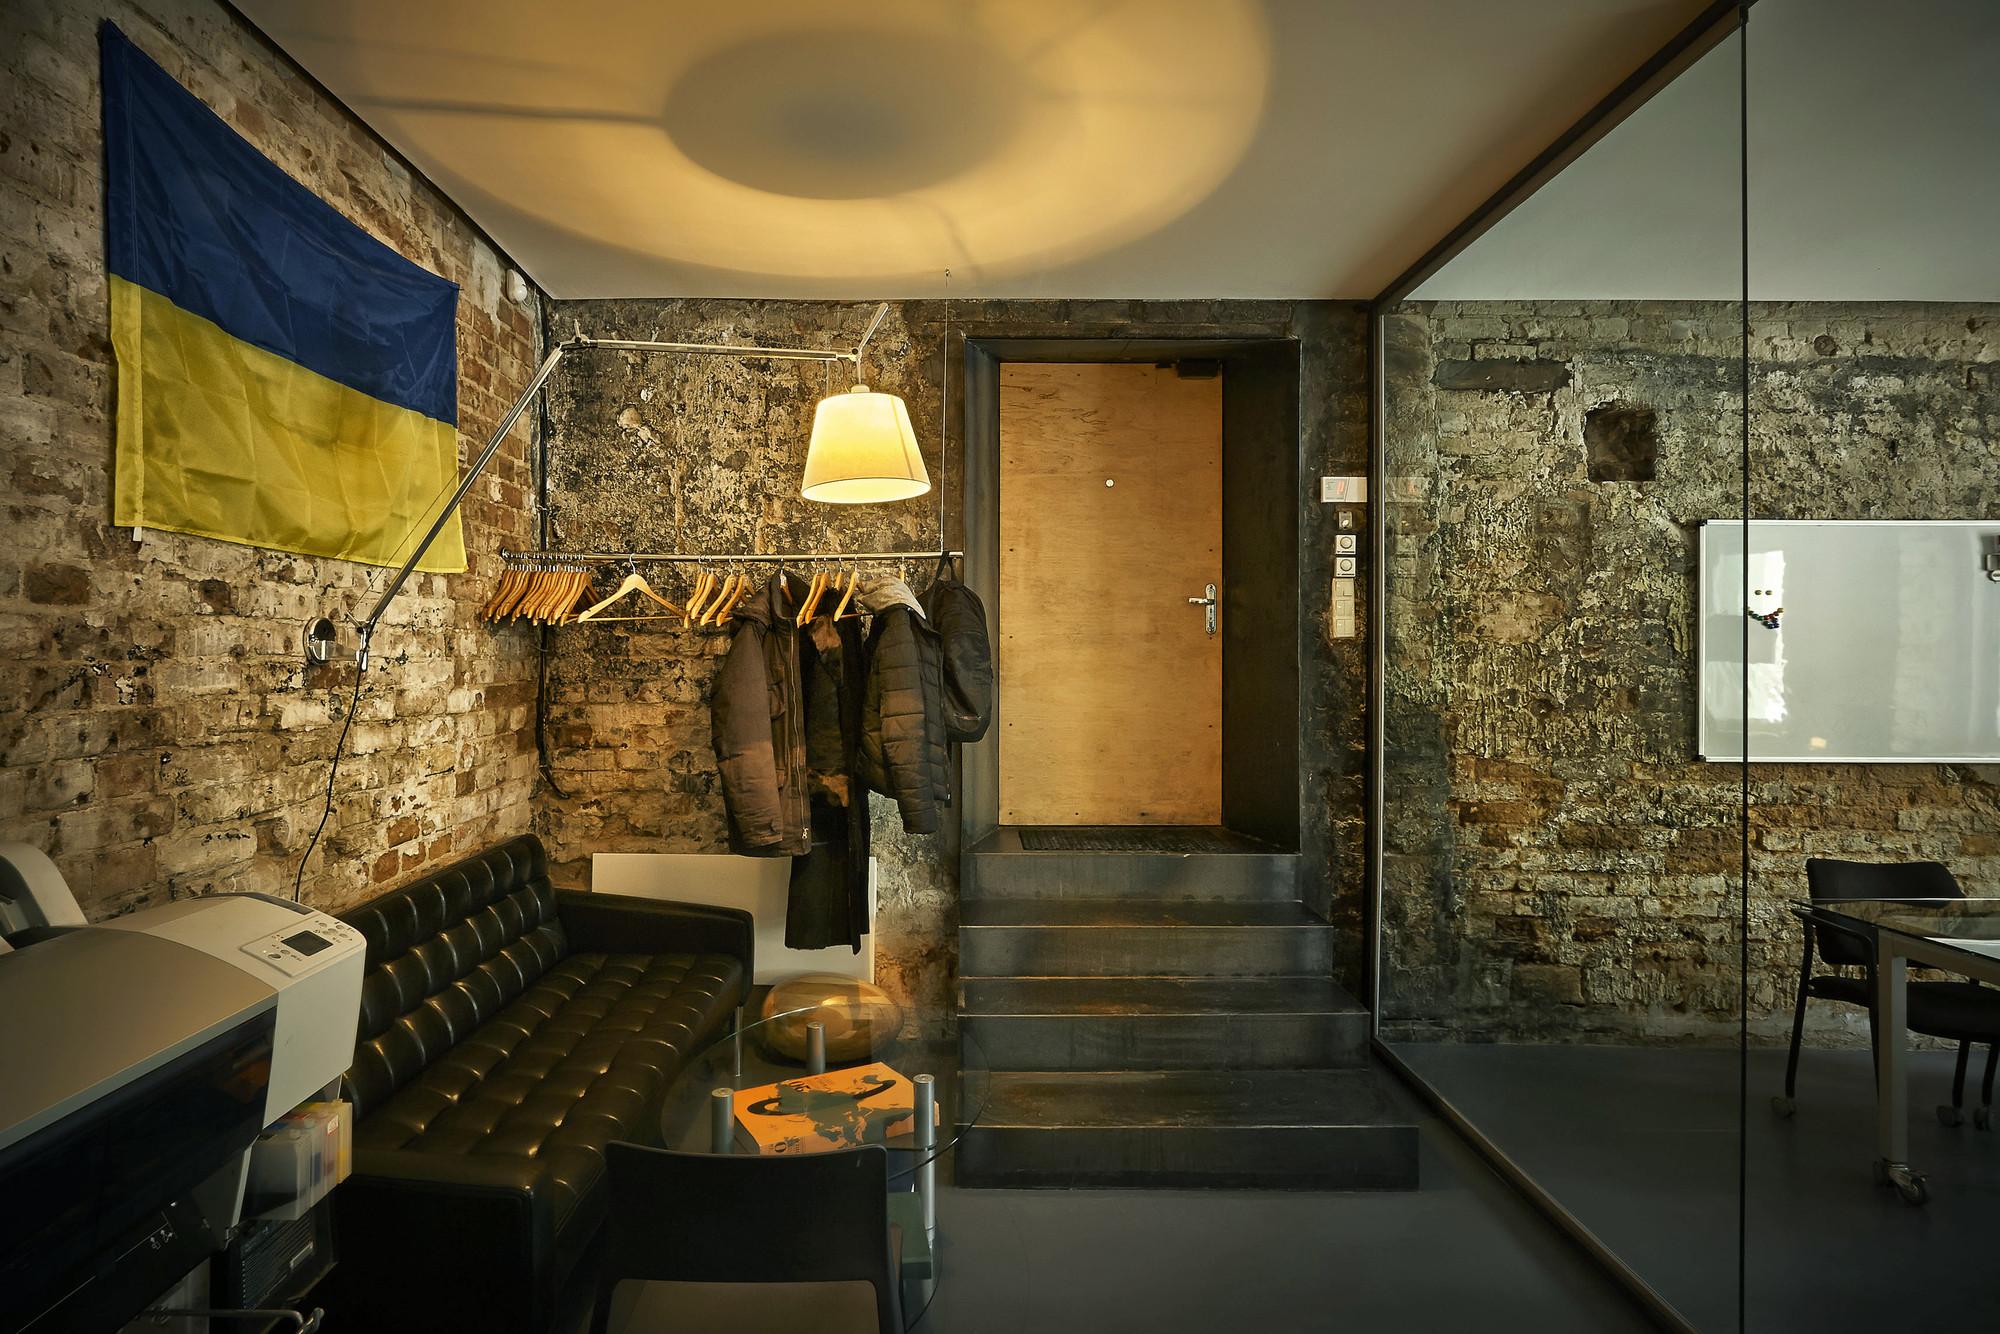 office zotov co architecture bureau zotov co archdaily. Black Bedroom Furniture Sets. Home Design Ideas